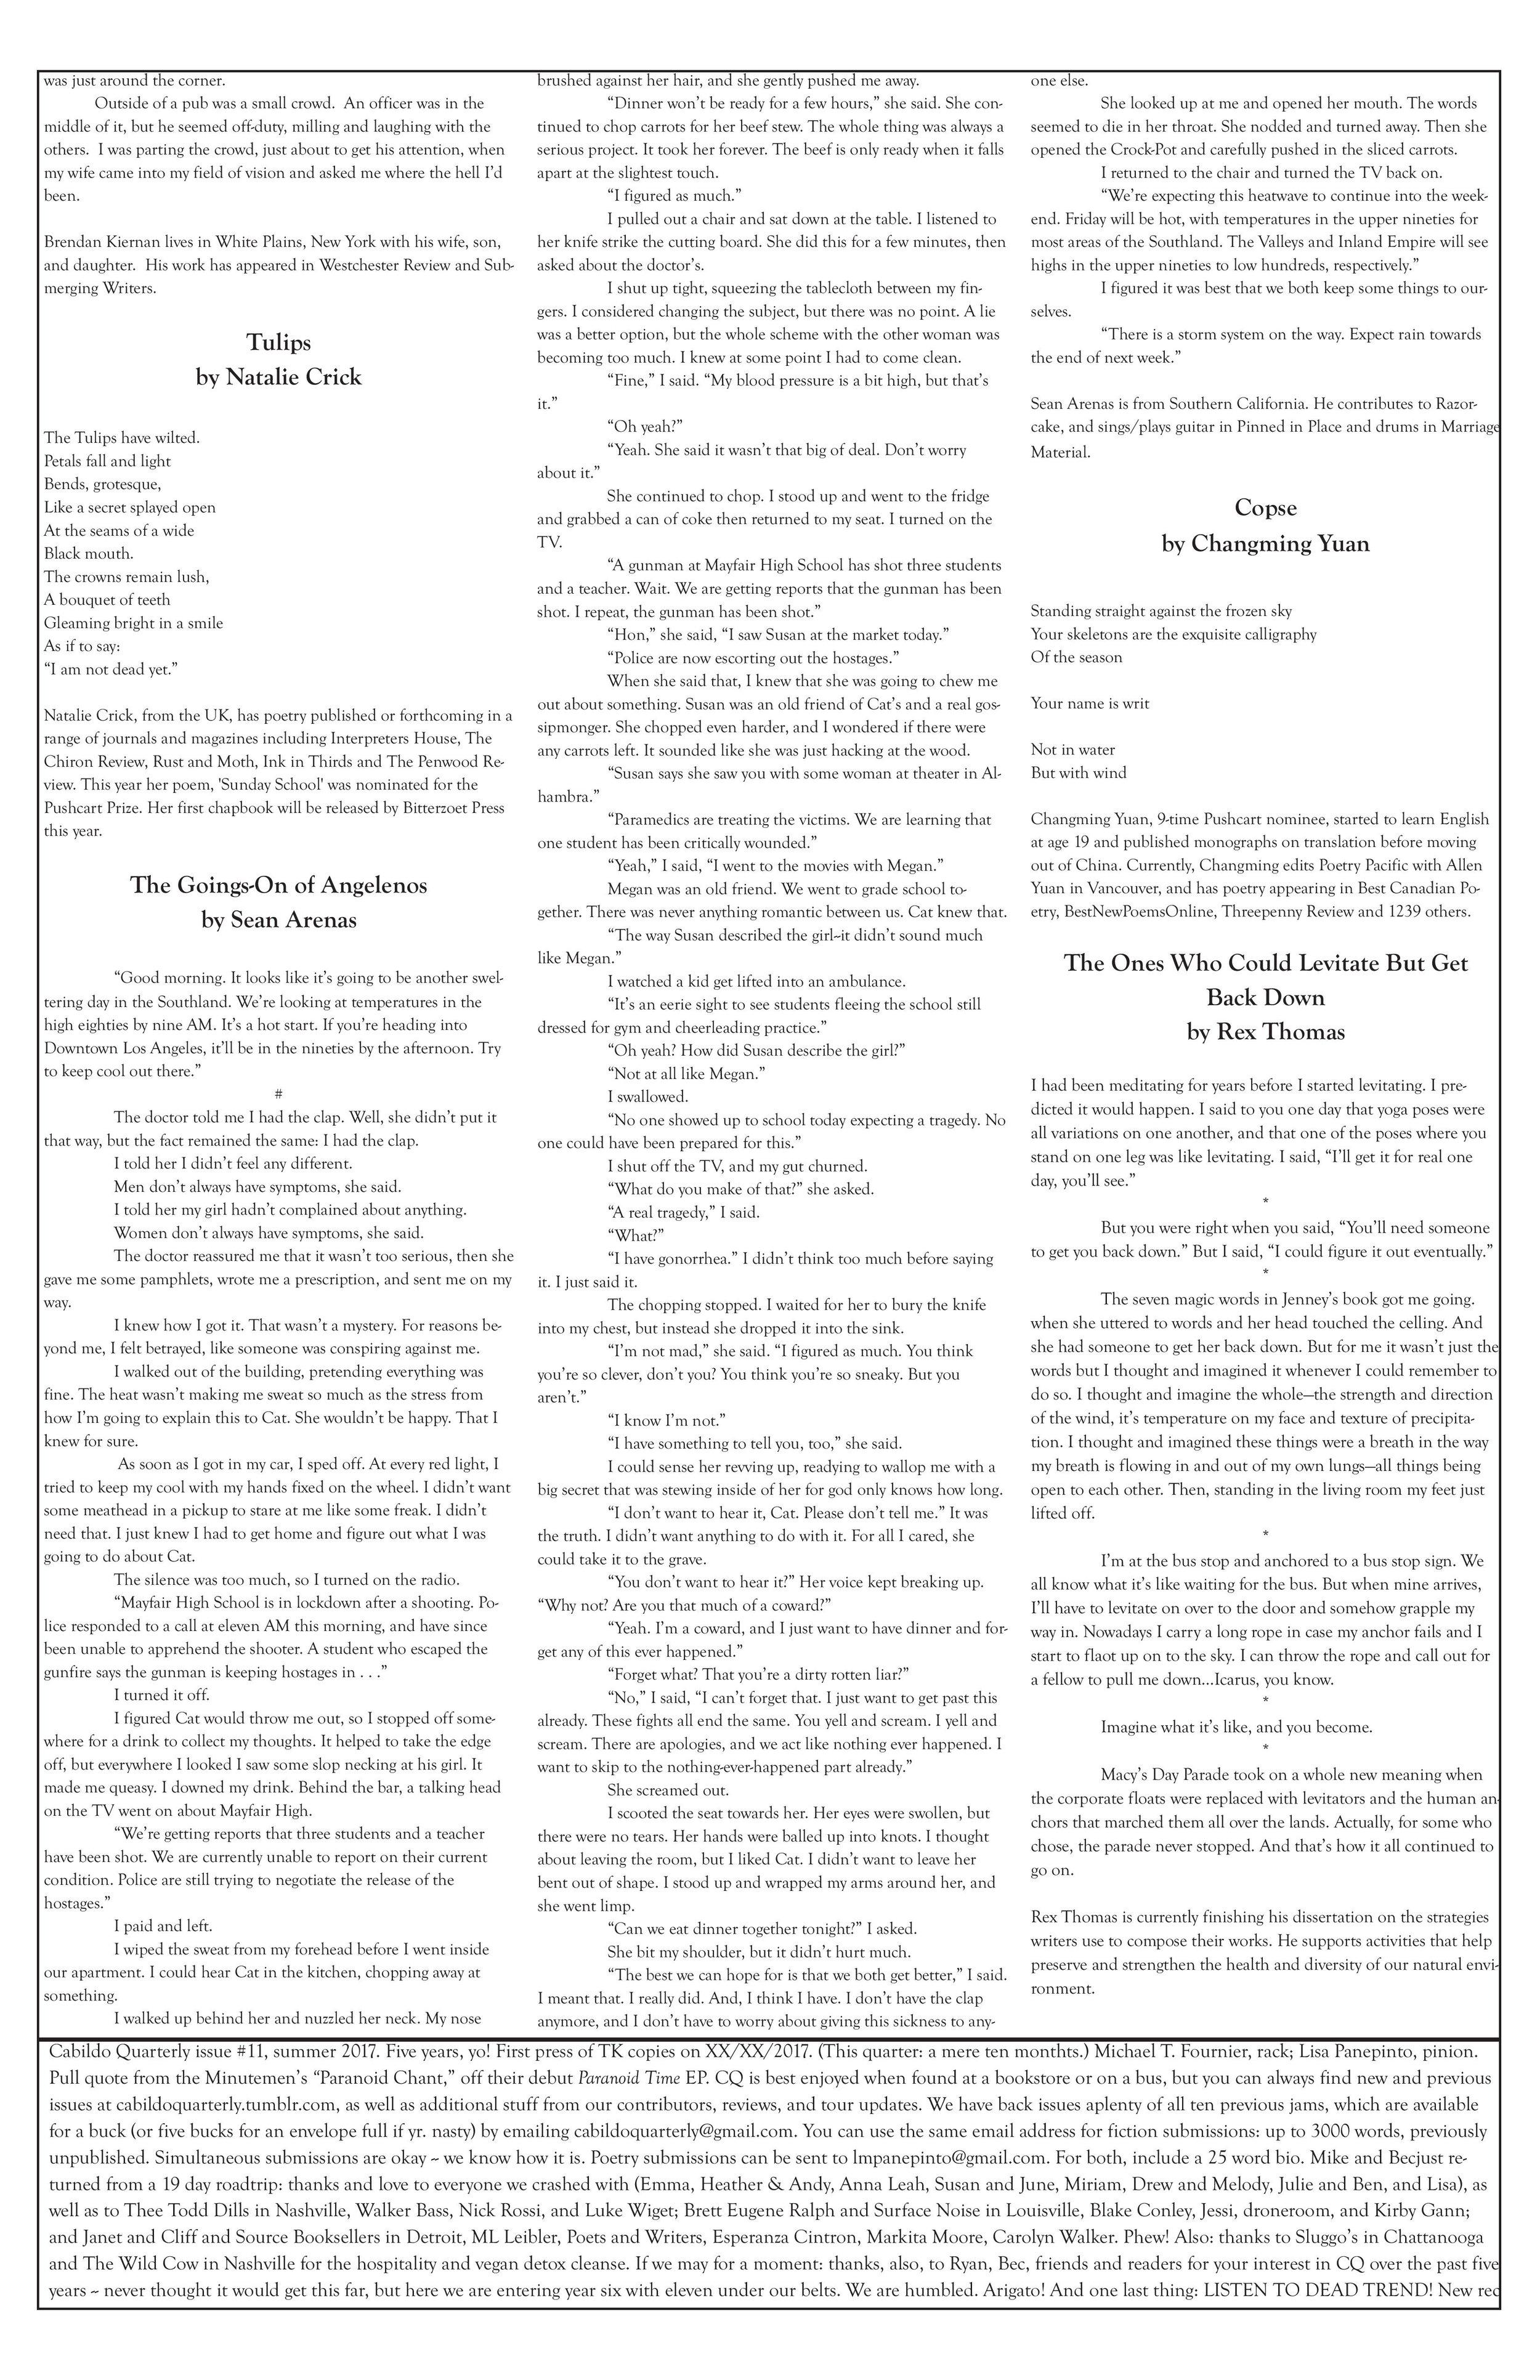 Cabildo 11 rough-page-002.jpg